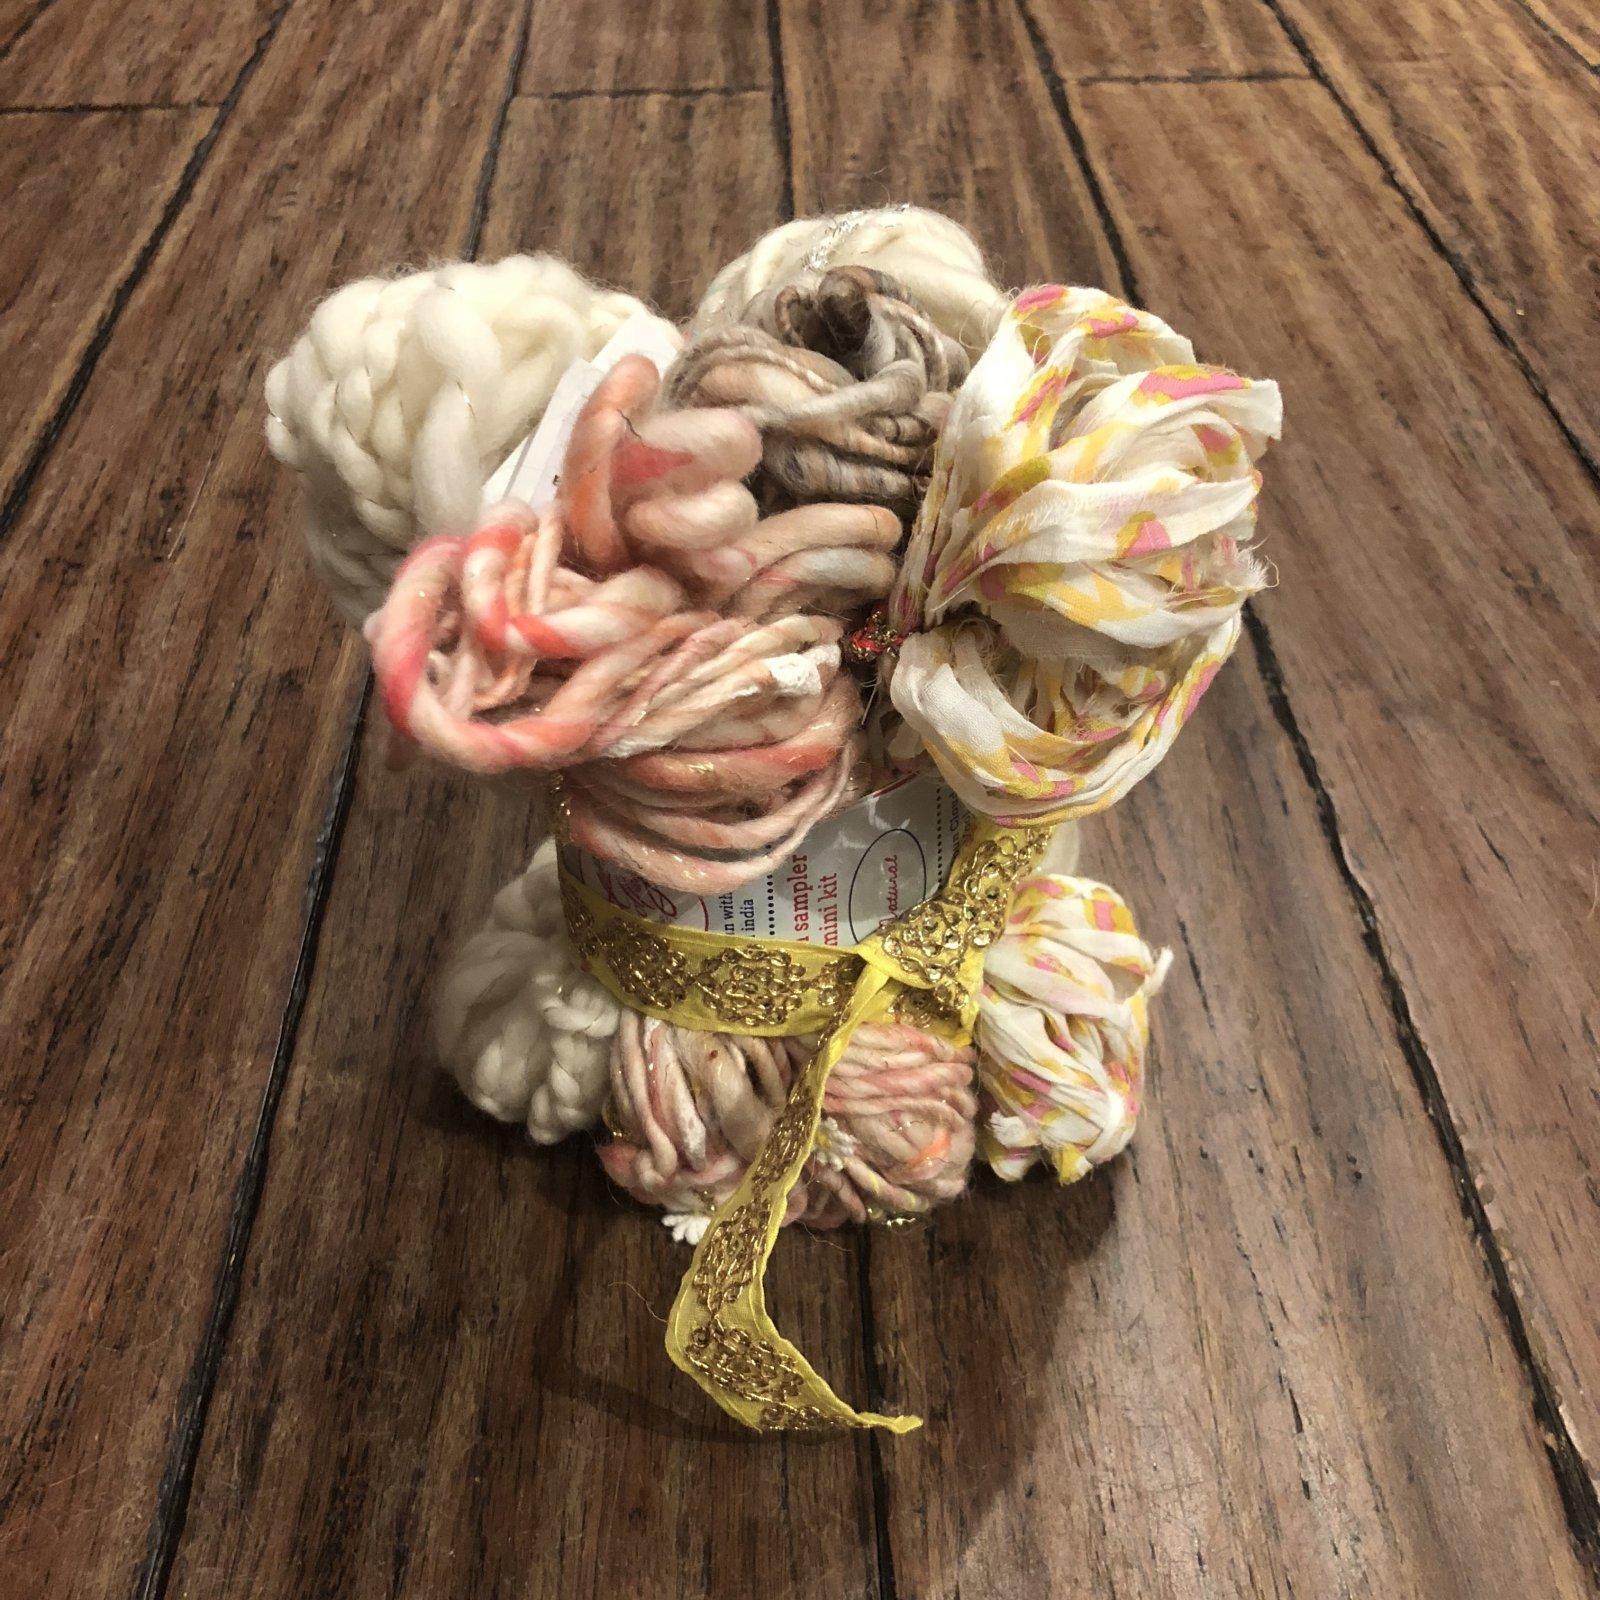 Knit Collage Sampler Kit